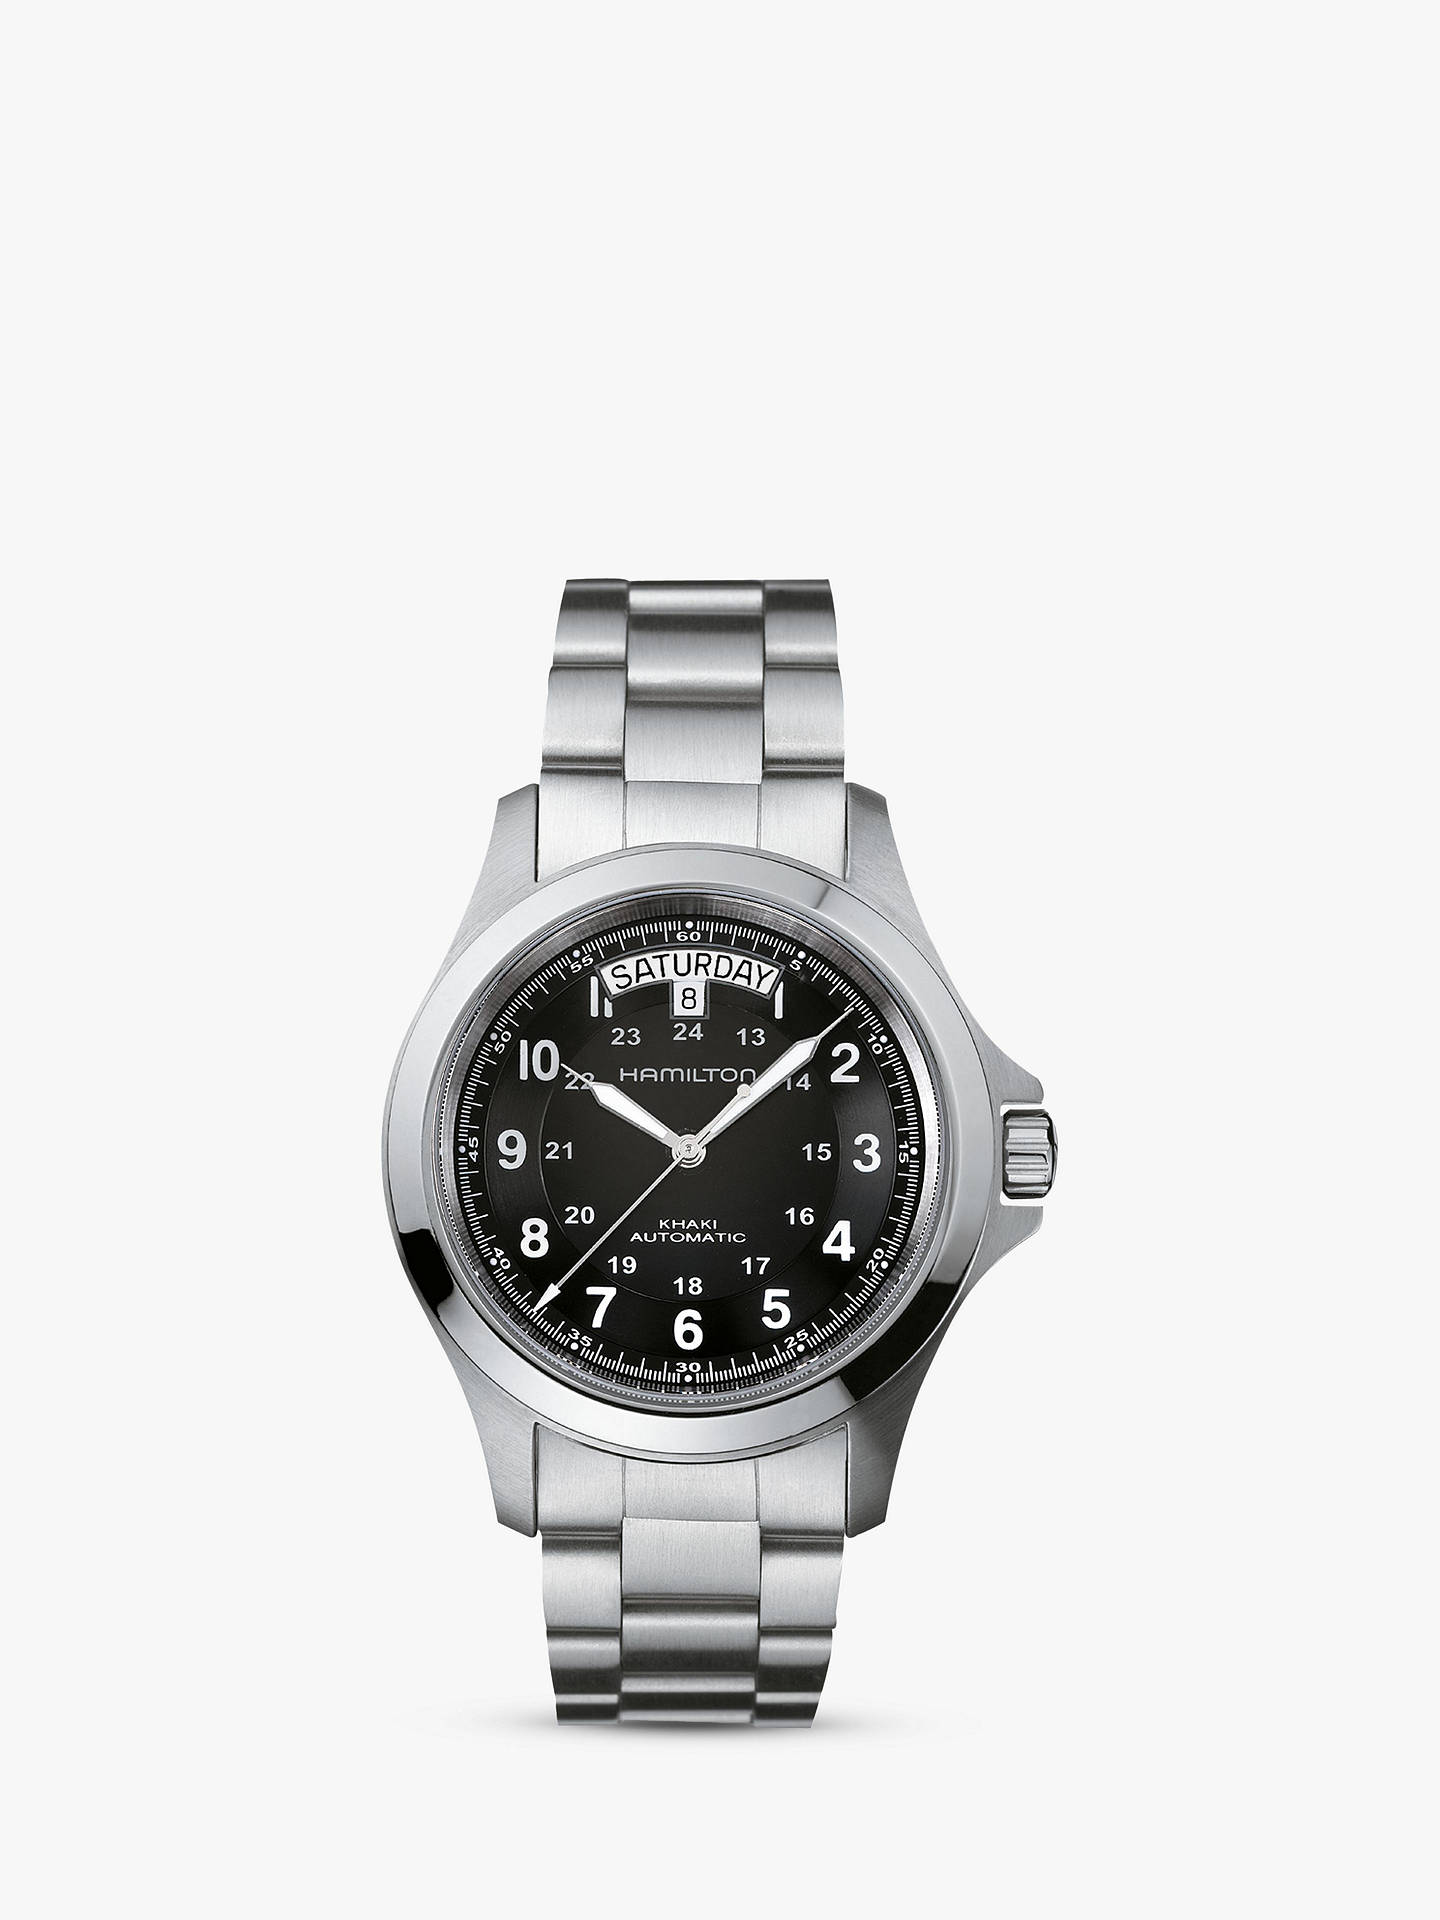 4cae0ec3c8 Buy Hamilton H64455133 Men s Khaki Field King Automatic Day Date Bracelet  Strap Watch